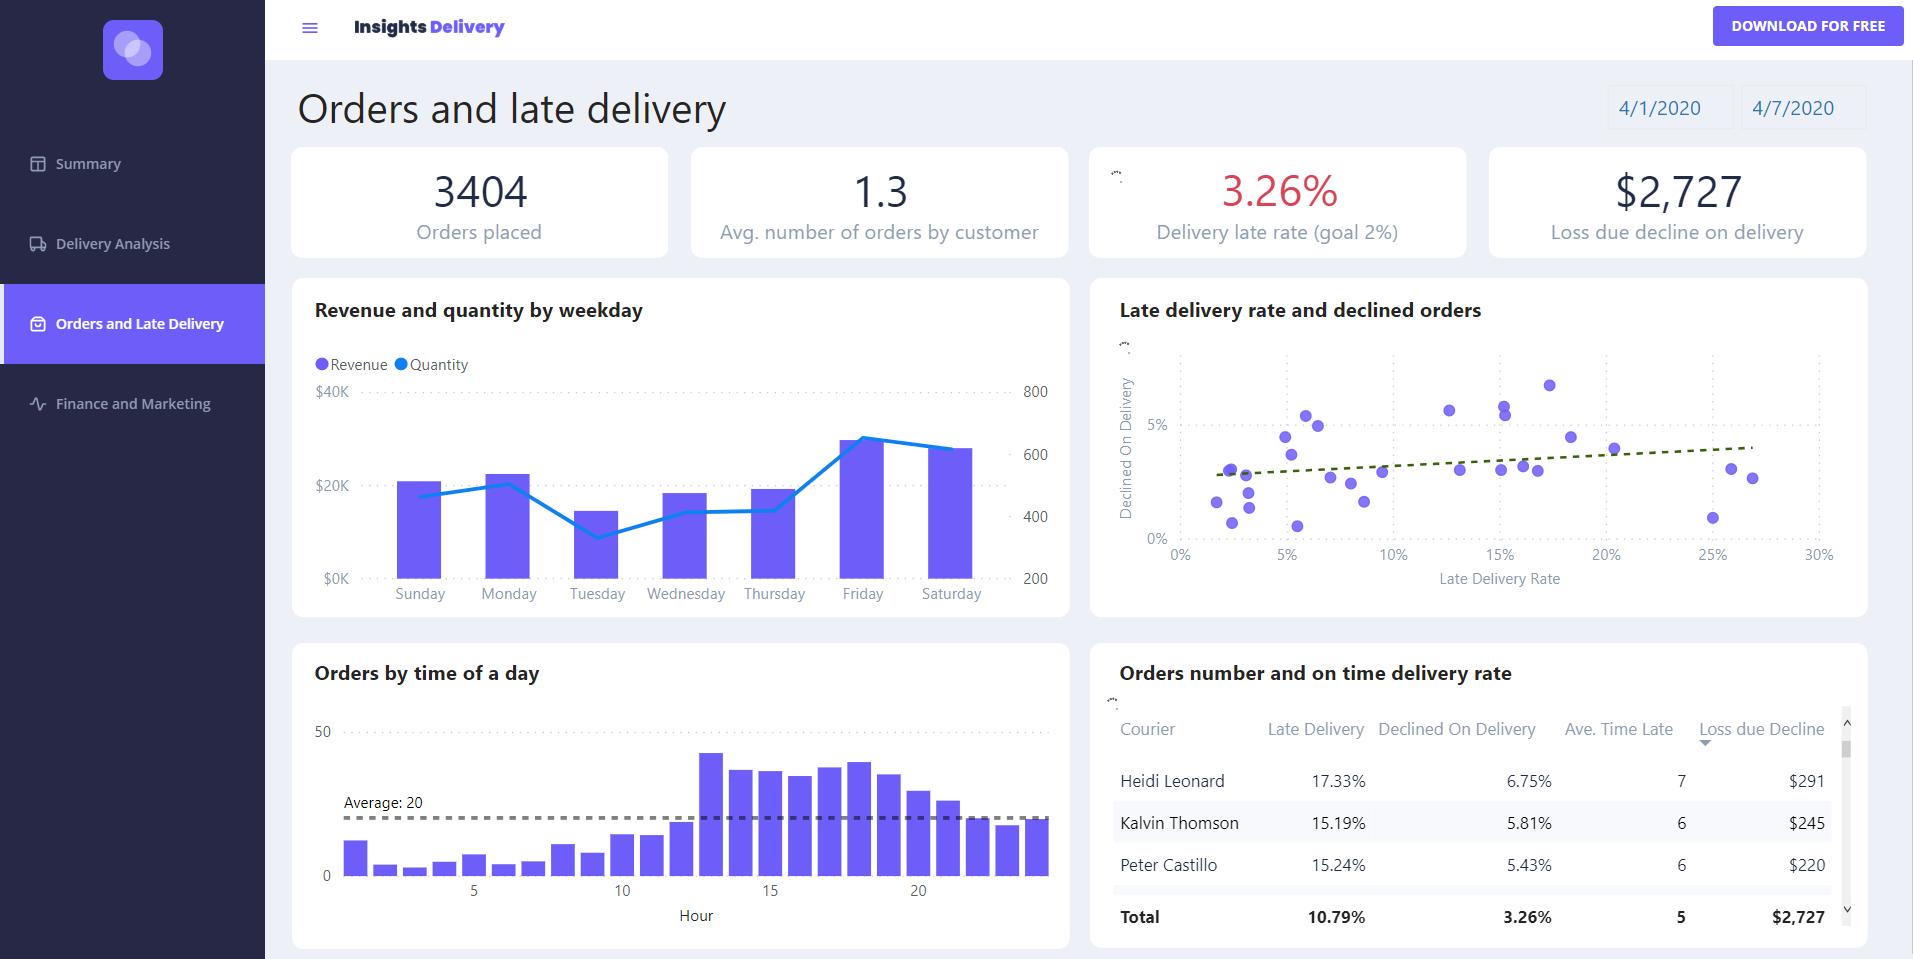 Insights Delivery BI Dashboard